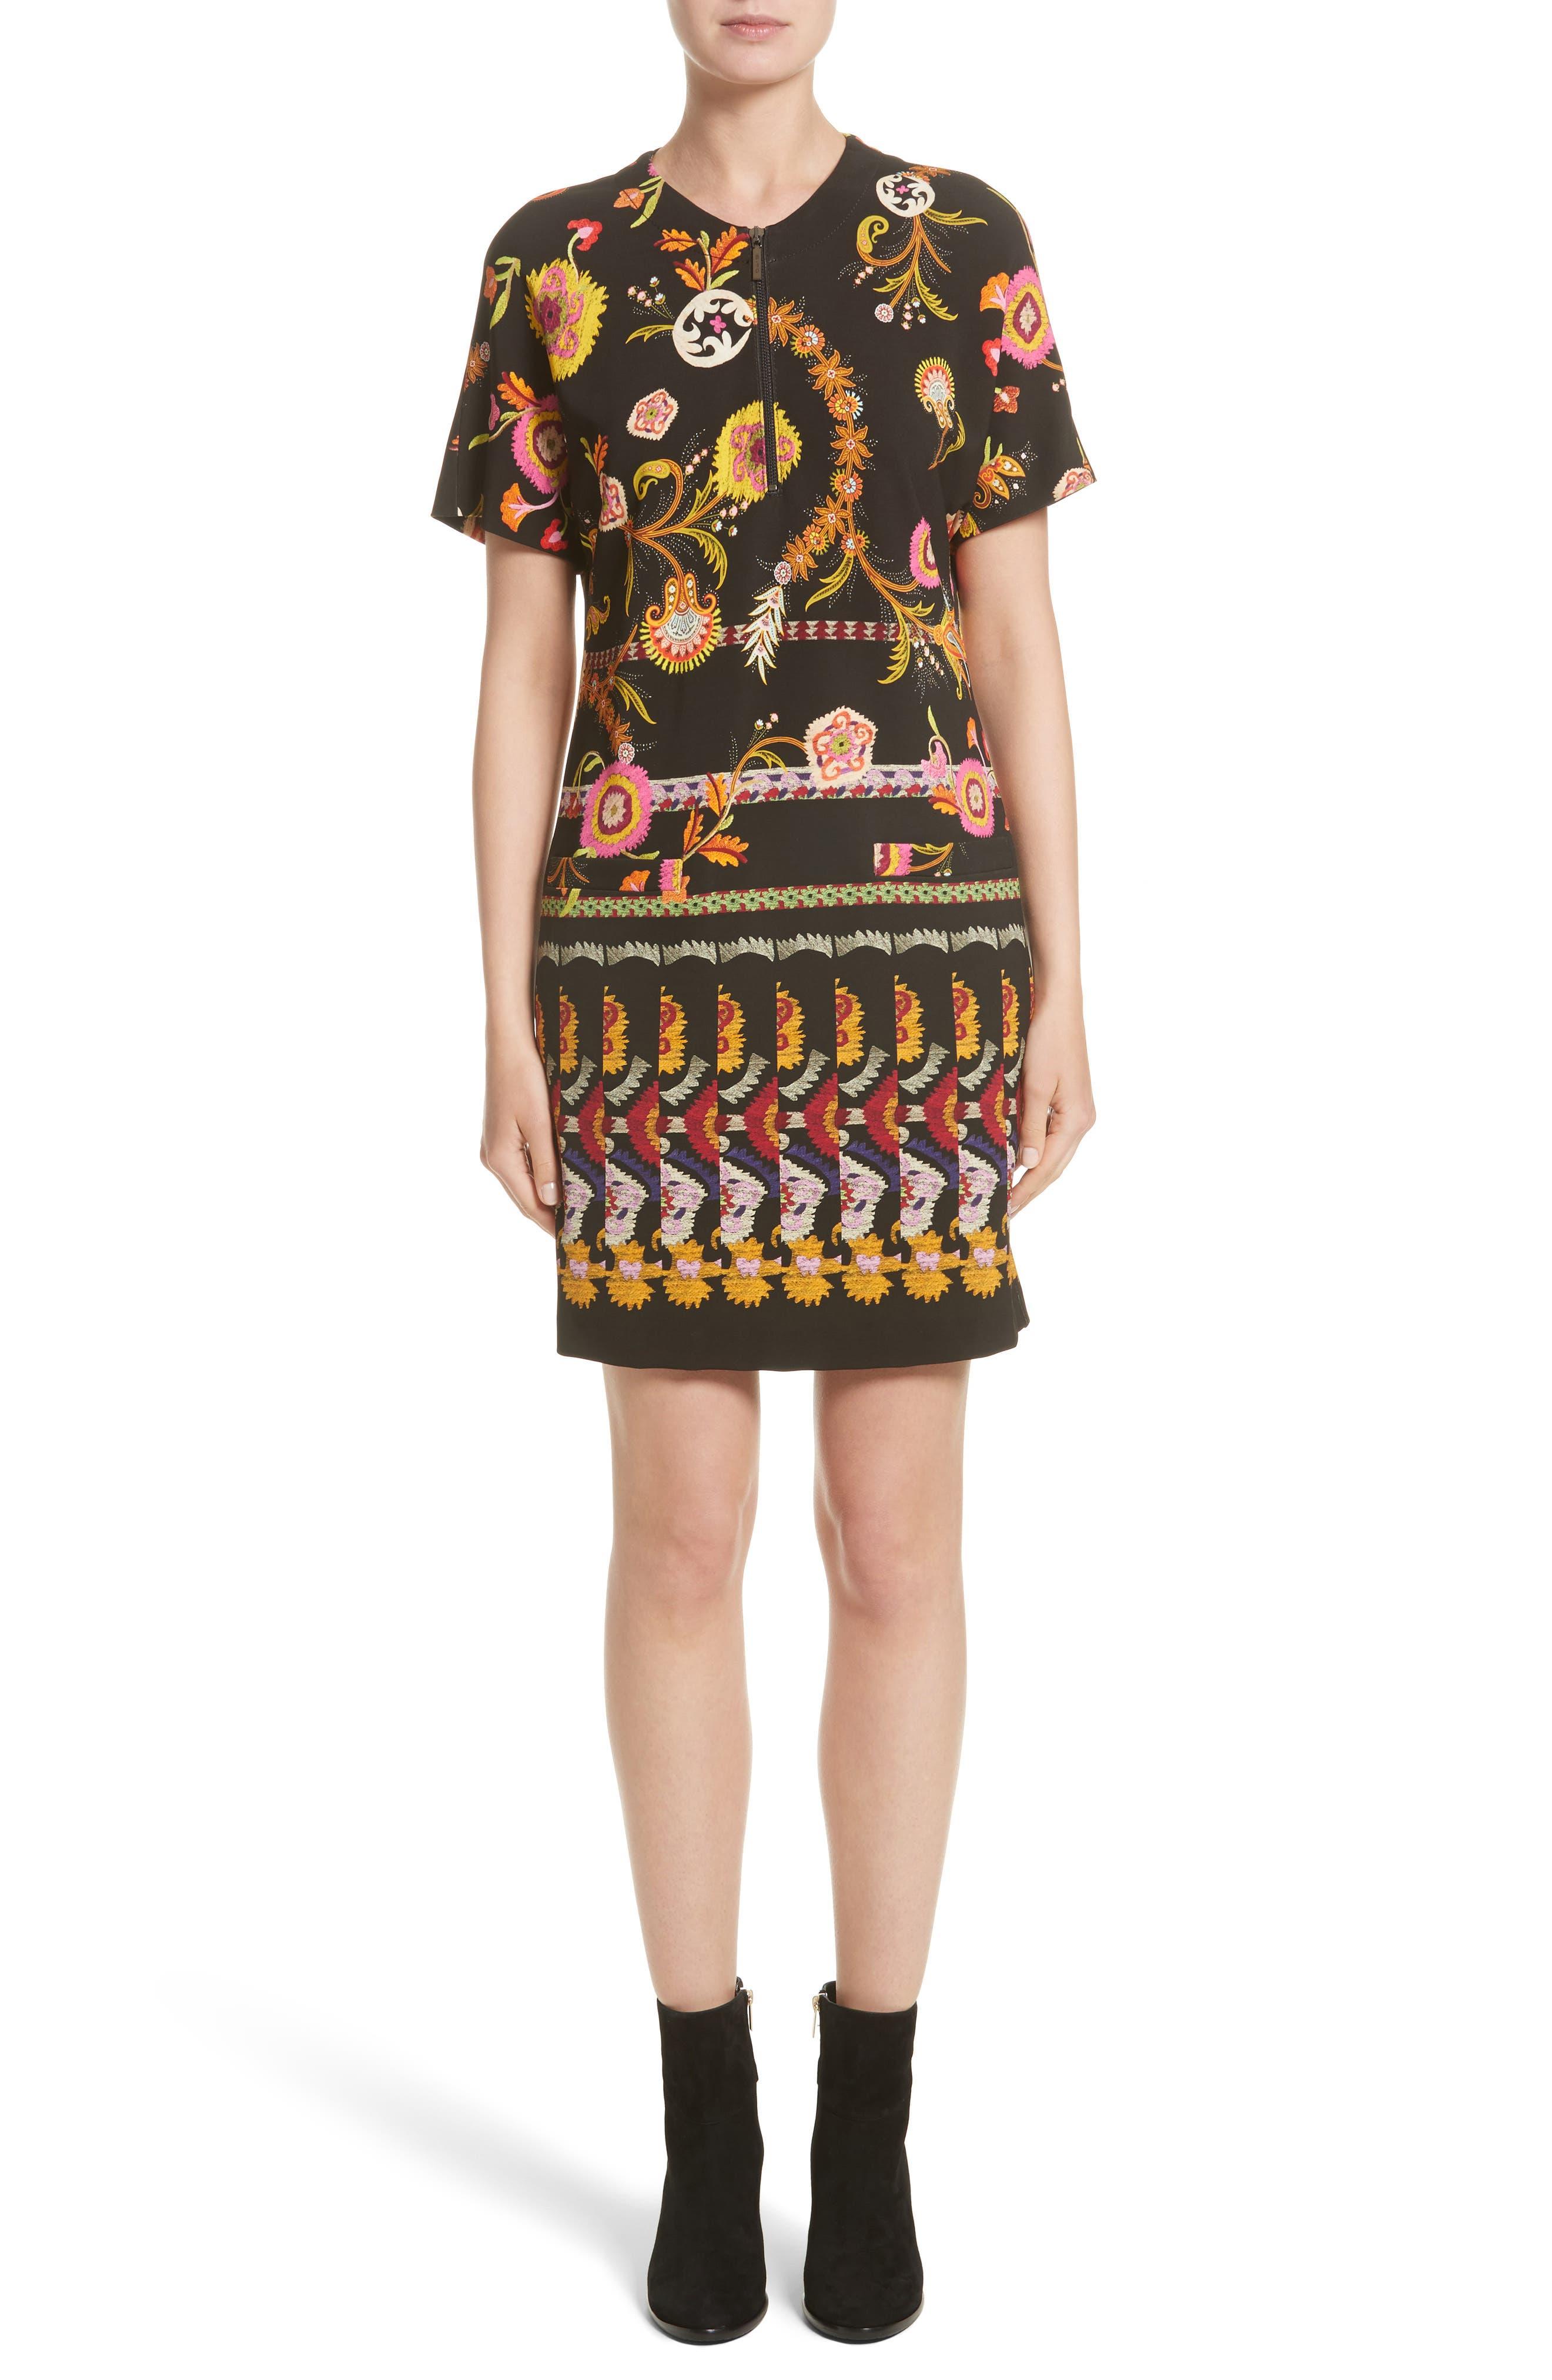 Etro Floral & Paisley Jersey Dress